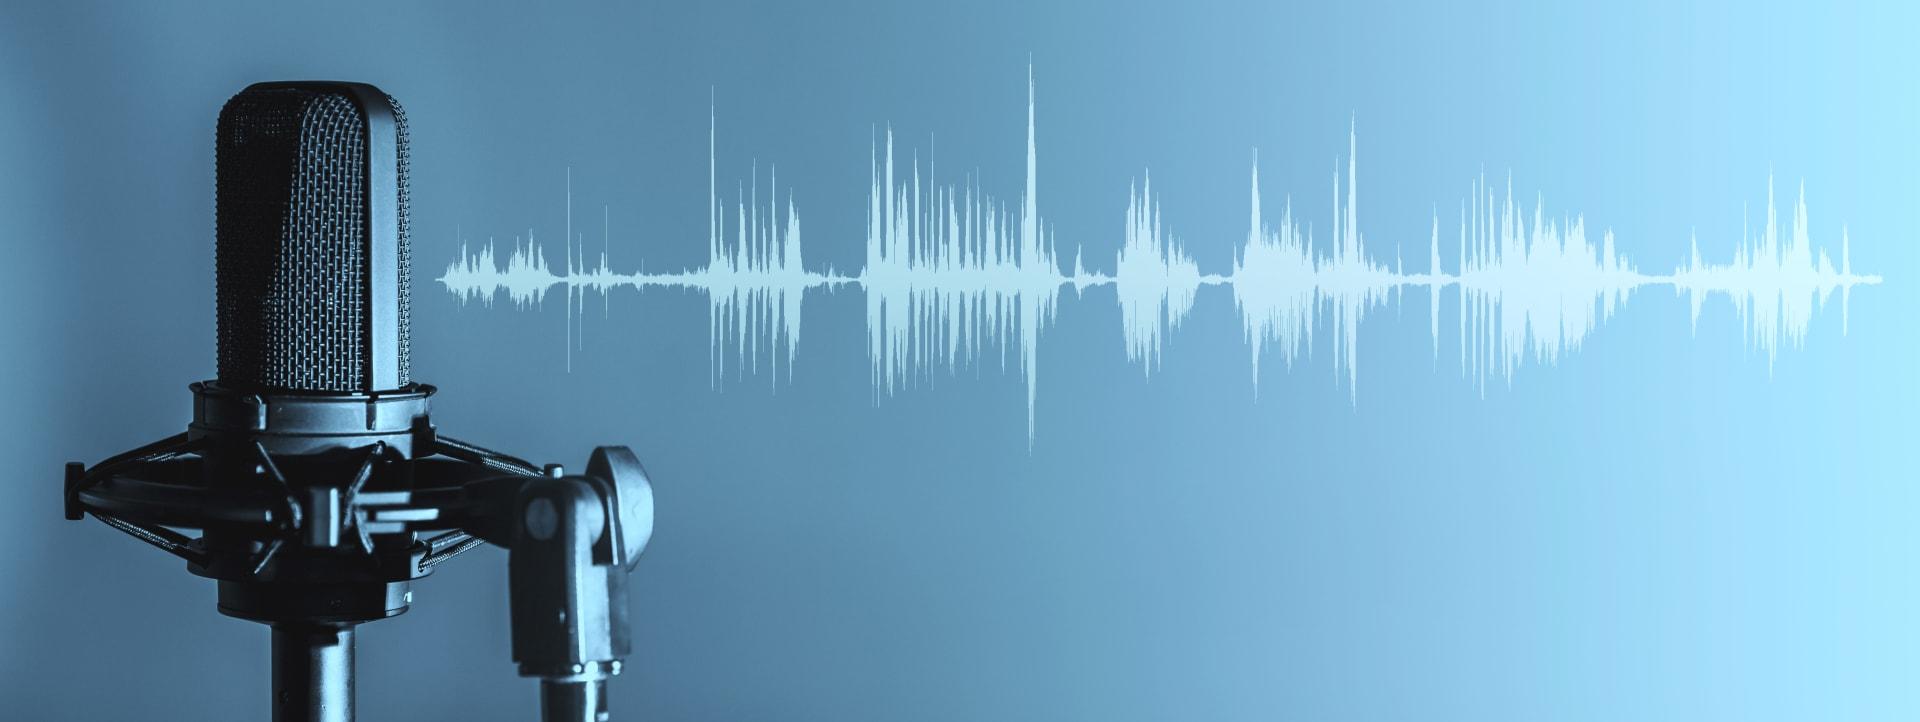 Podcast-AdobeStock_389908193-w1920.jpg